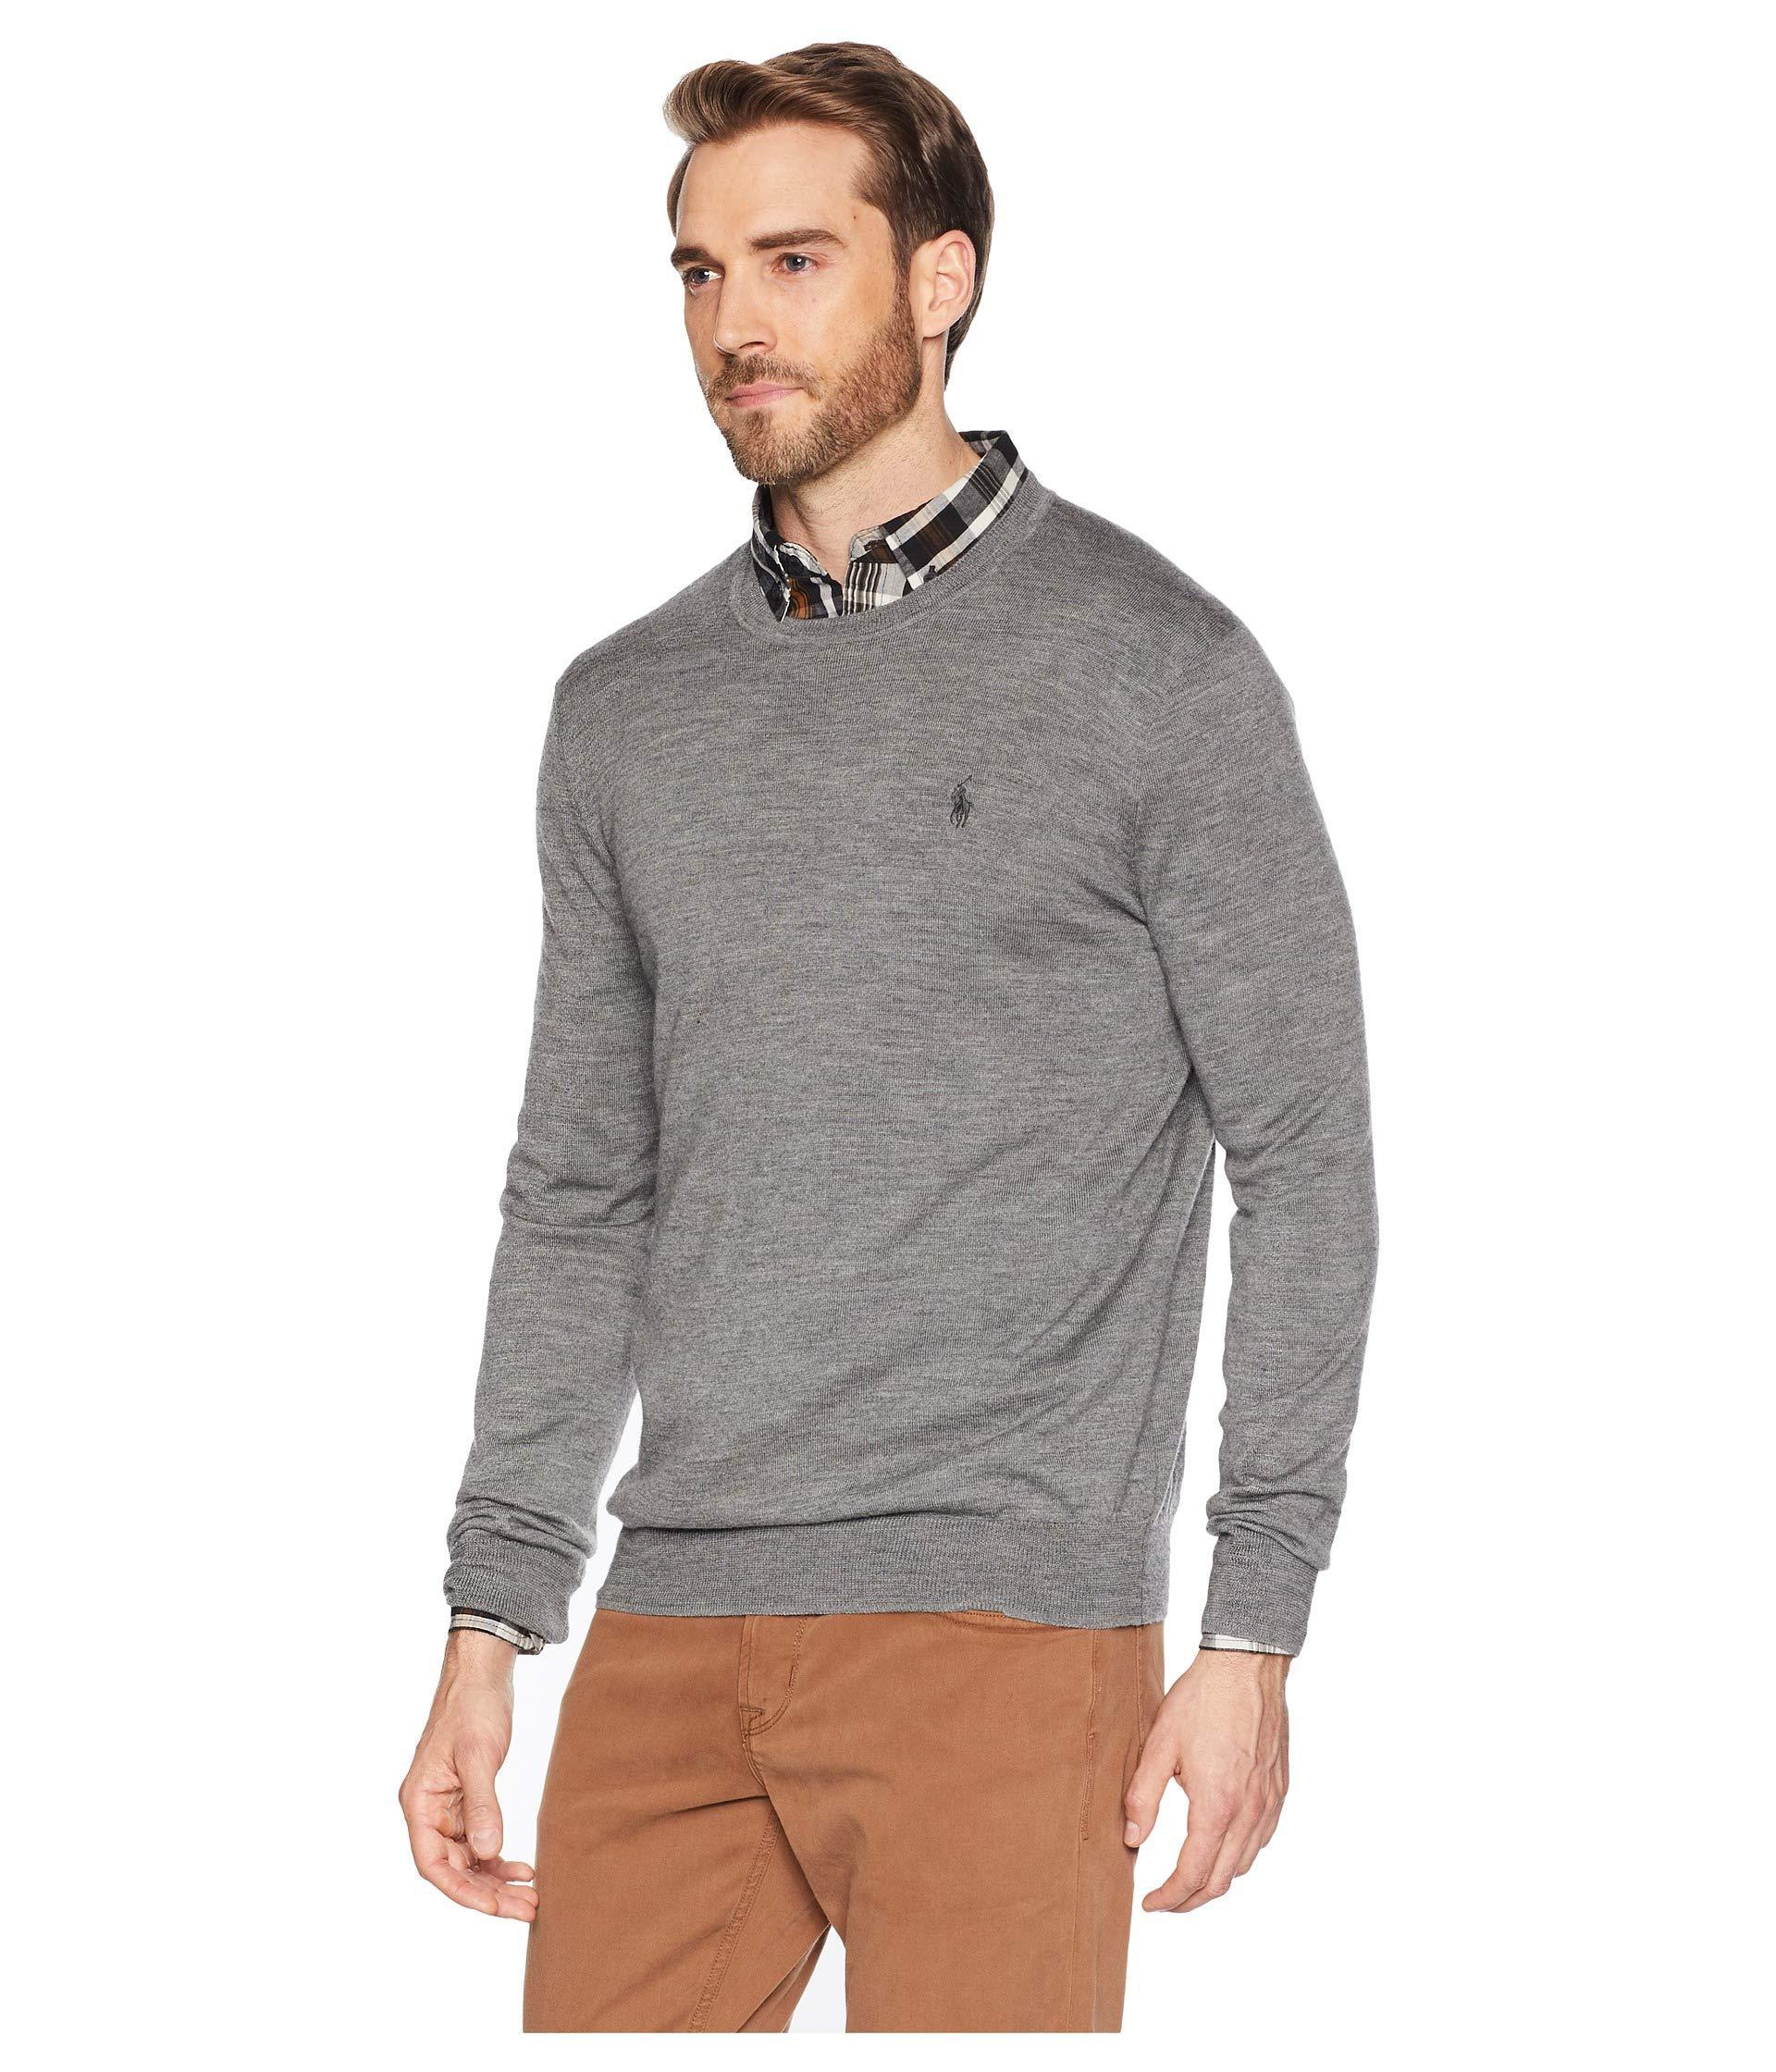 b3cfaac4875f8 Lyst - Polo Ralph Lauren Washable Merino Crew Neck Sweater in Gray for Men